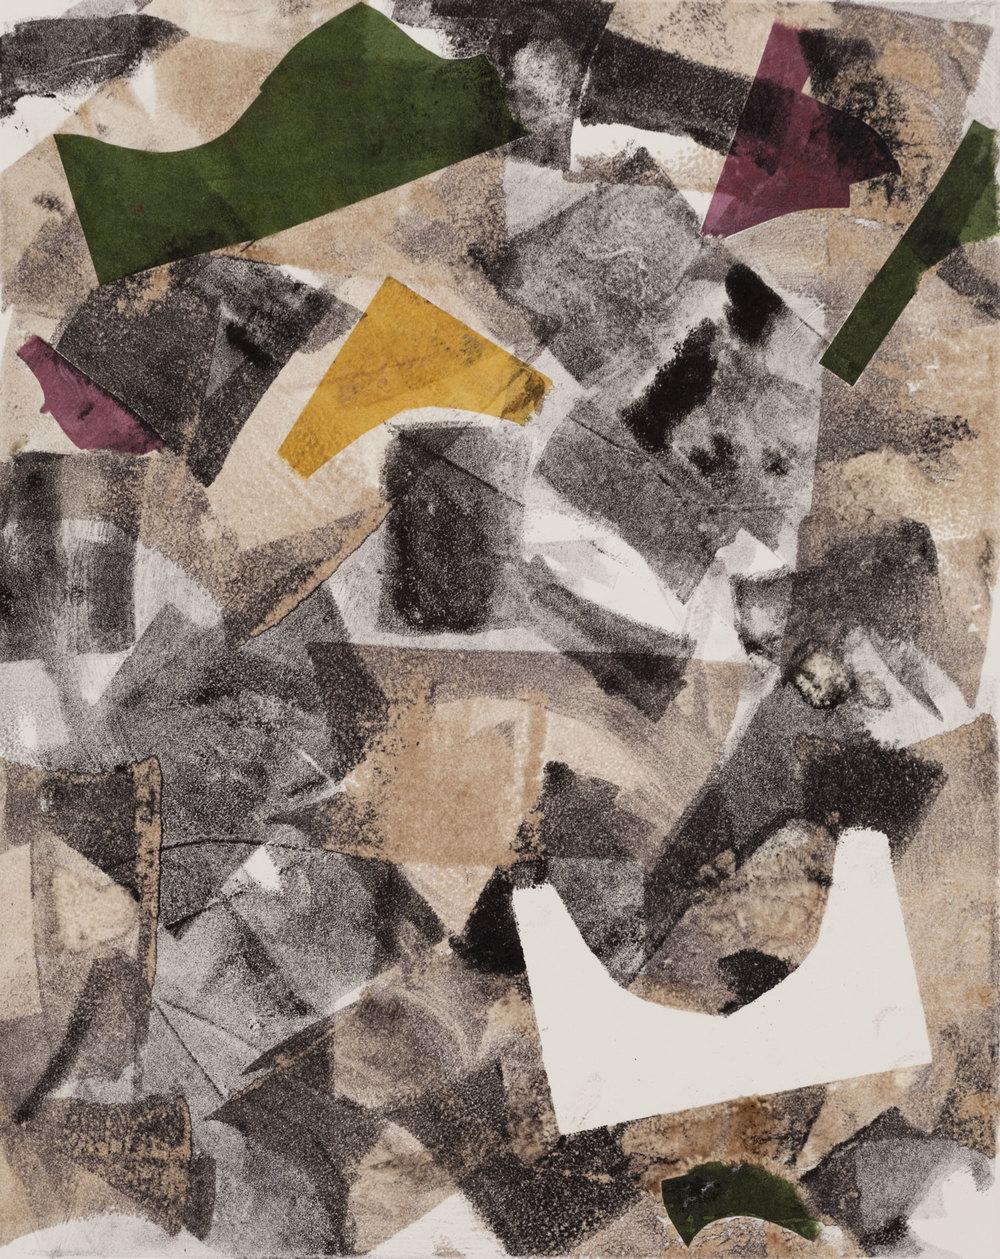 "Mortadella , 2013, monoprint with collage, 8 x 10"", SOLD"